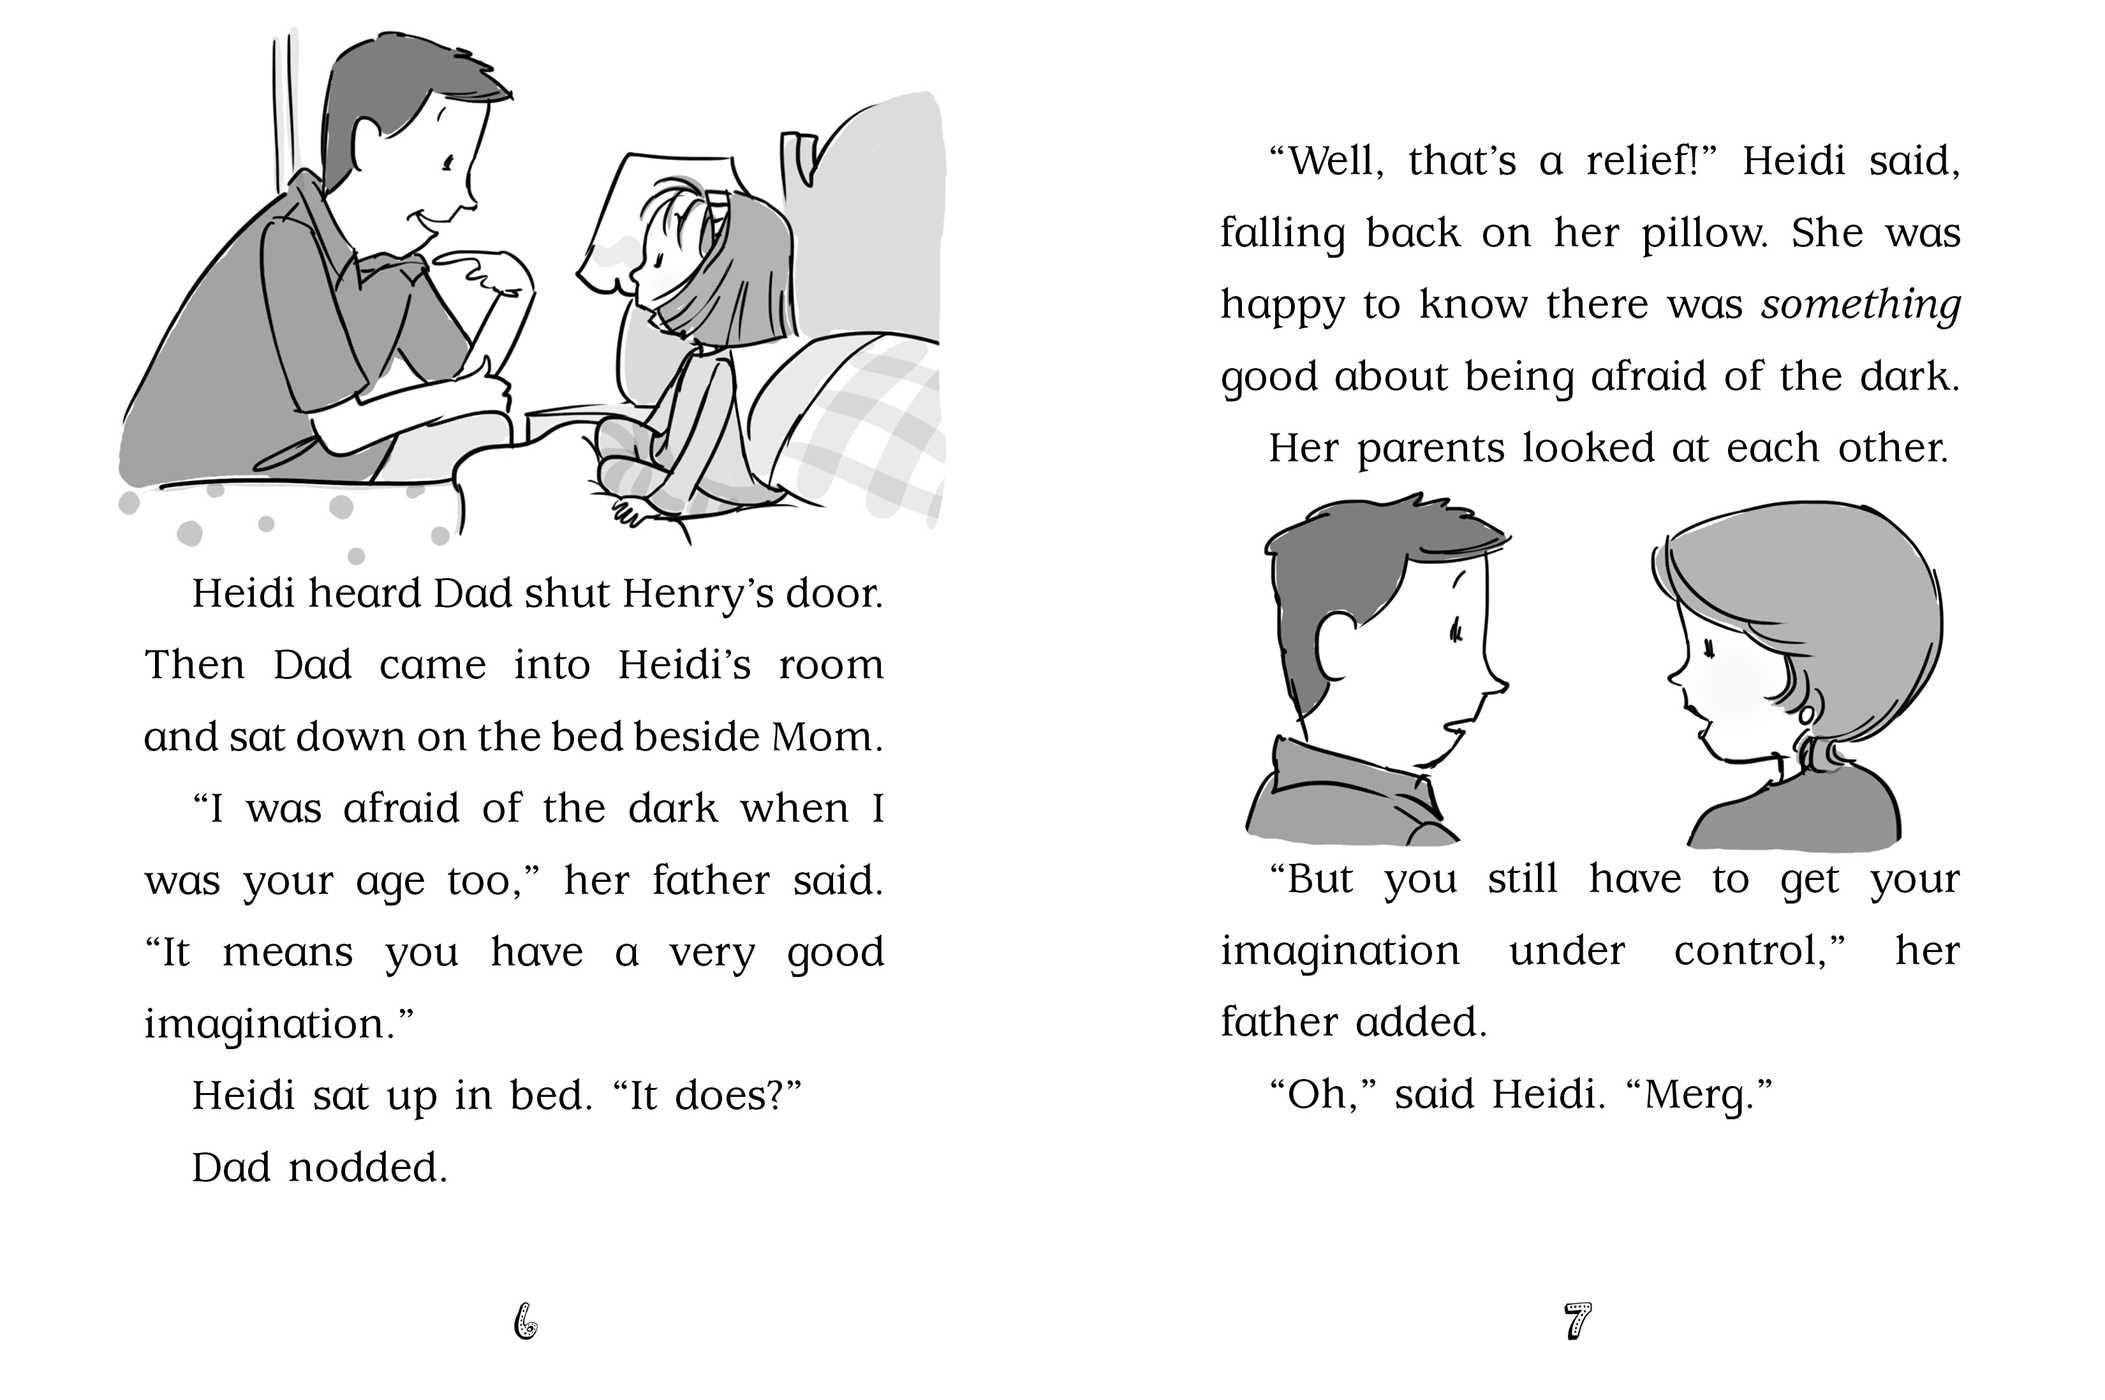 Heidi heckelbeck might be afraid of the dark 9781481446280.in01